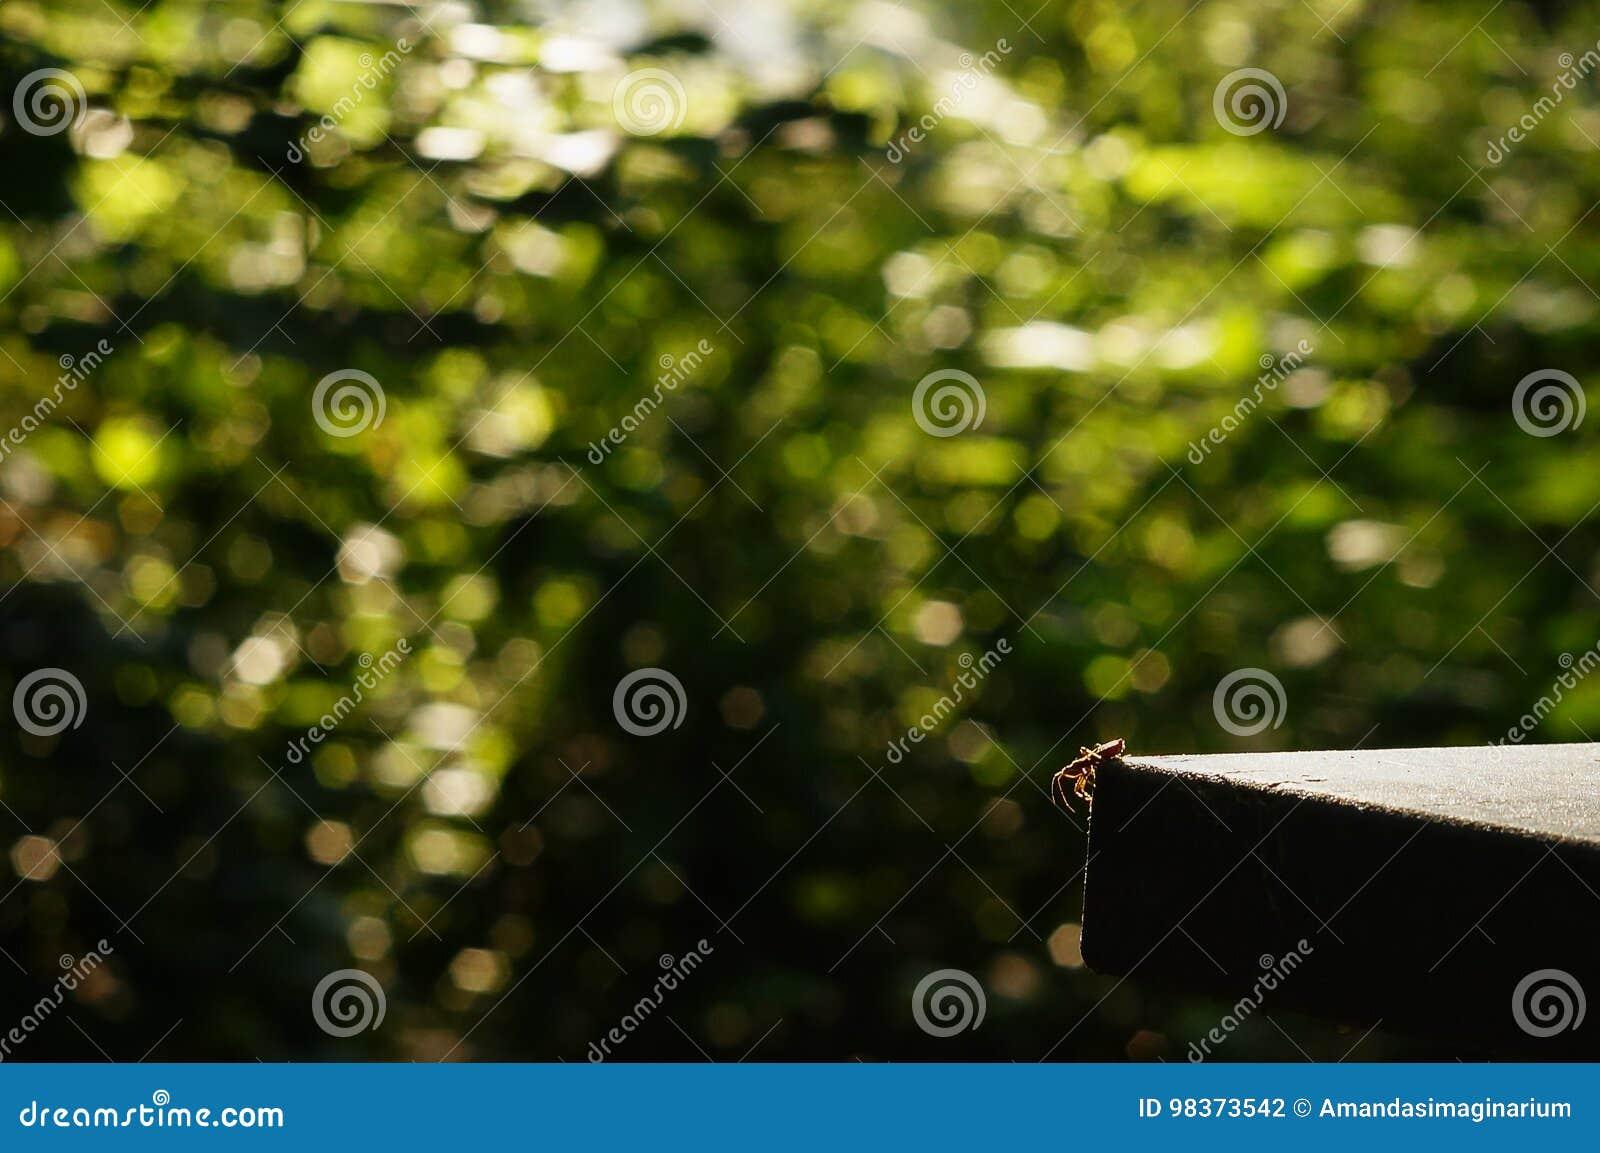 Bug On A Foliage Background With Circular Bokeh Stock Photo - Image